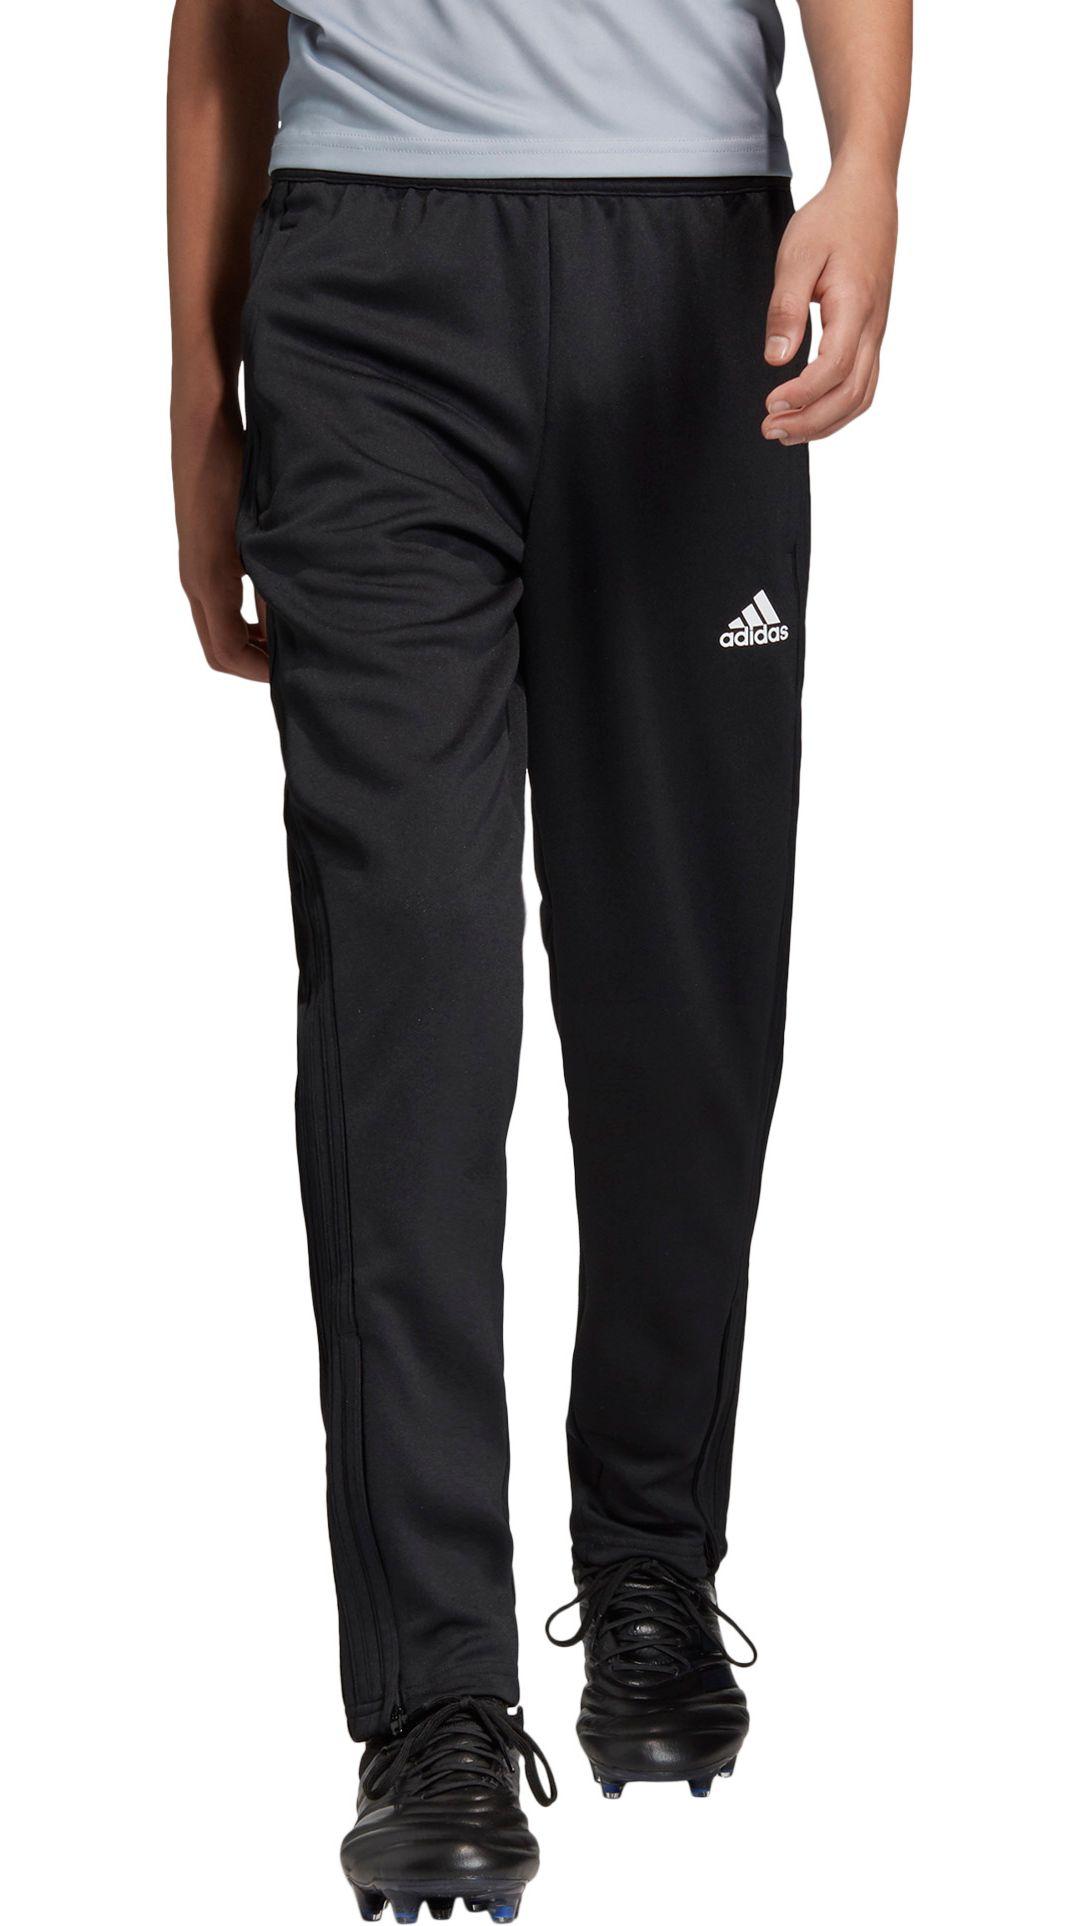 adidas Boys' Condivo 18 Training Pants